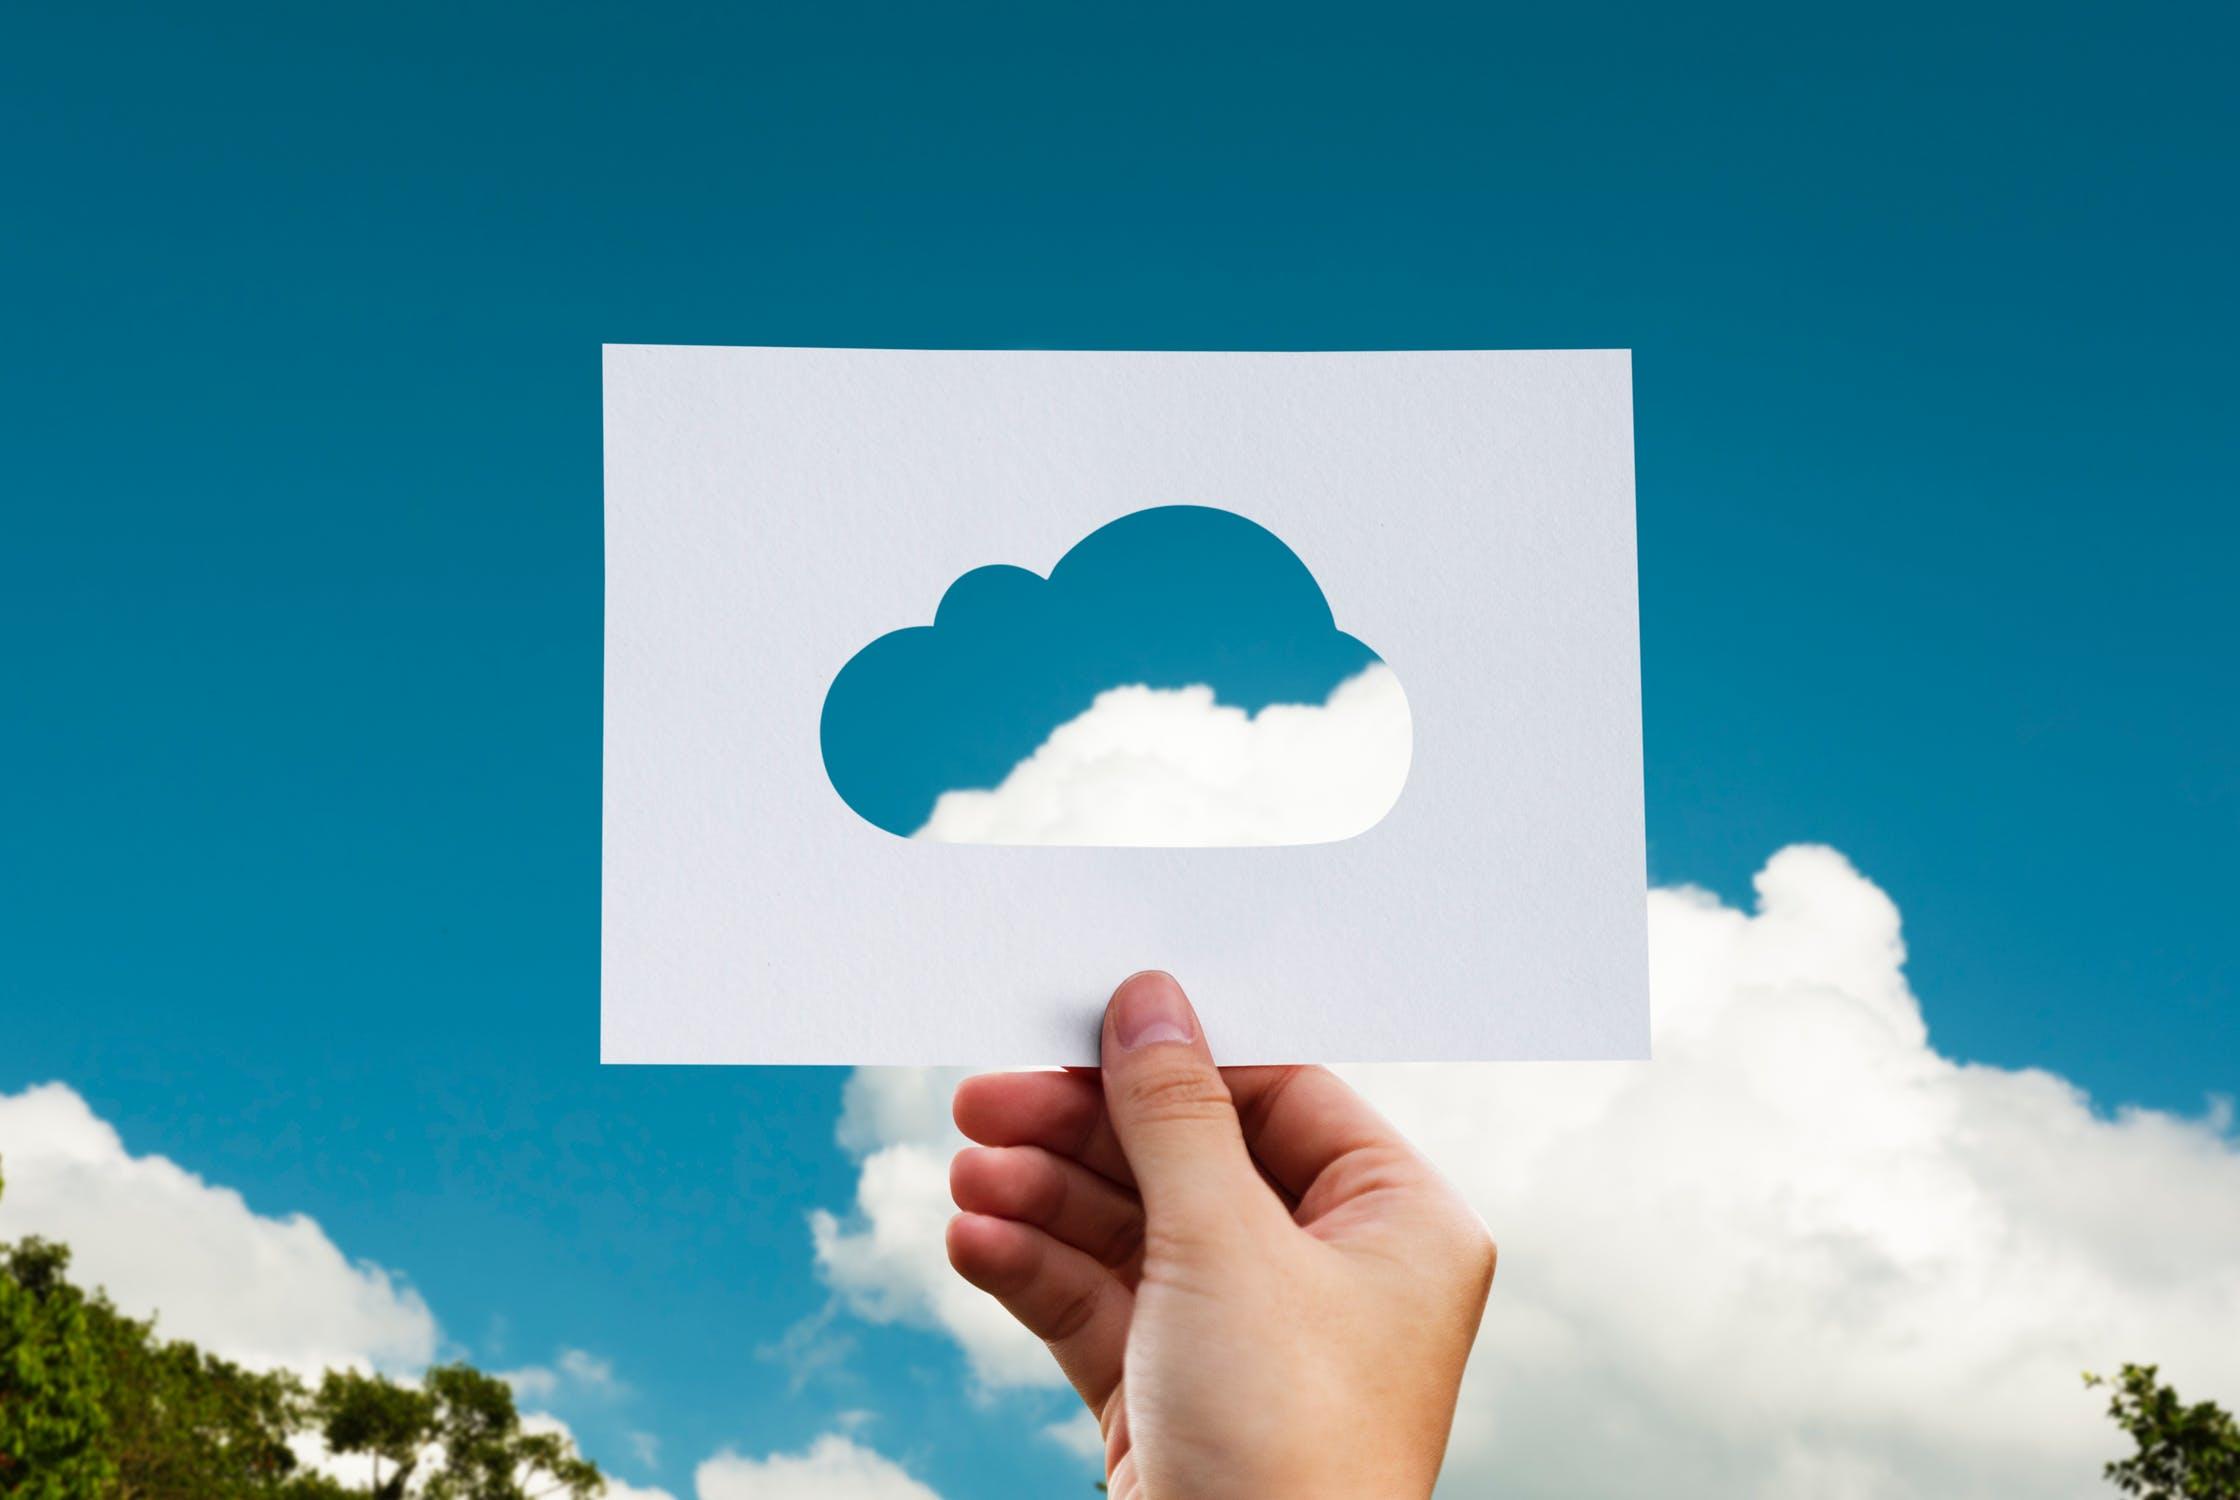 barnett-ravenscroft-birmingham-cloud-based-accounting